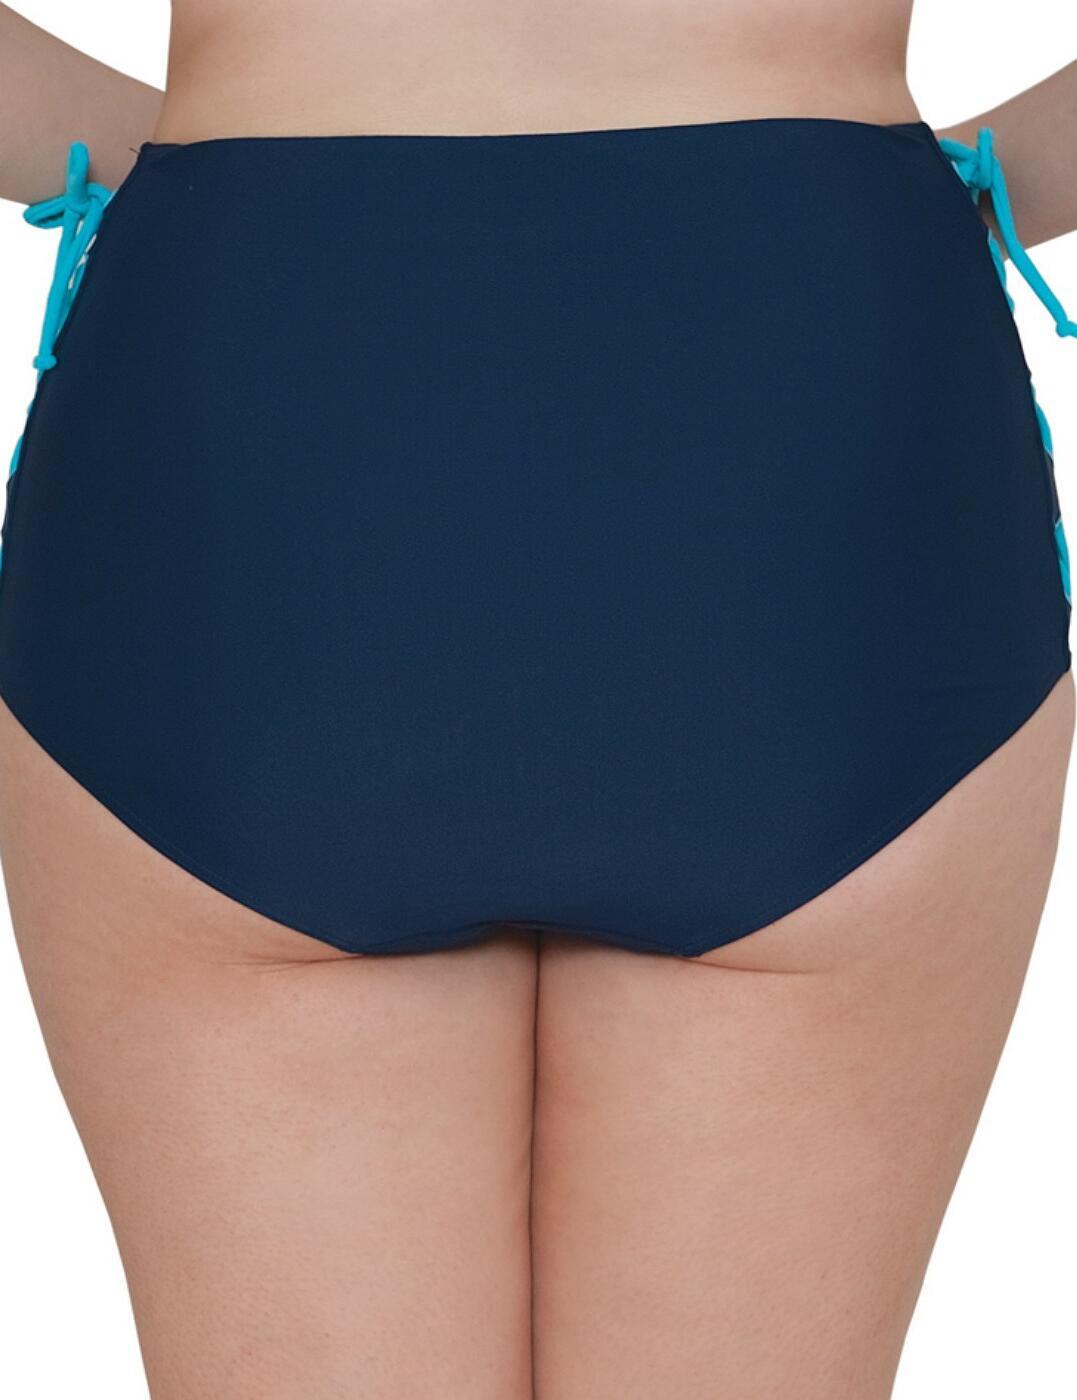 CS4065 Curvy Kate Set Sail High Waist Bikini Brief - CS4065 Indigo Mix